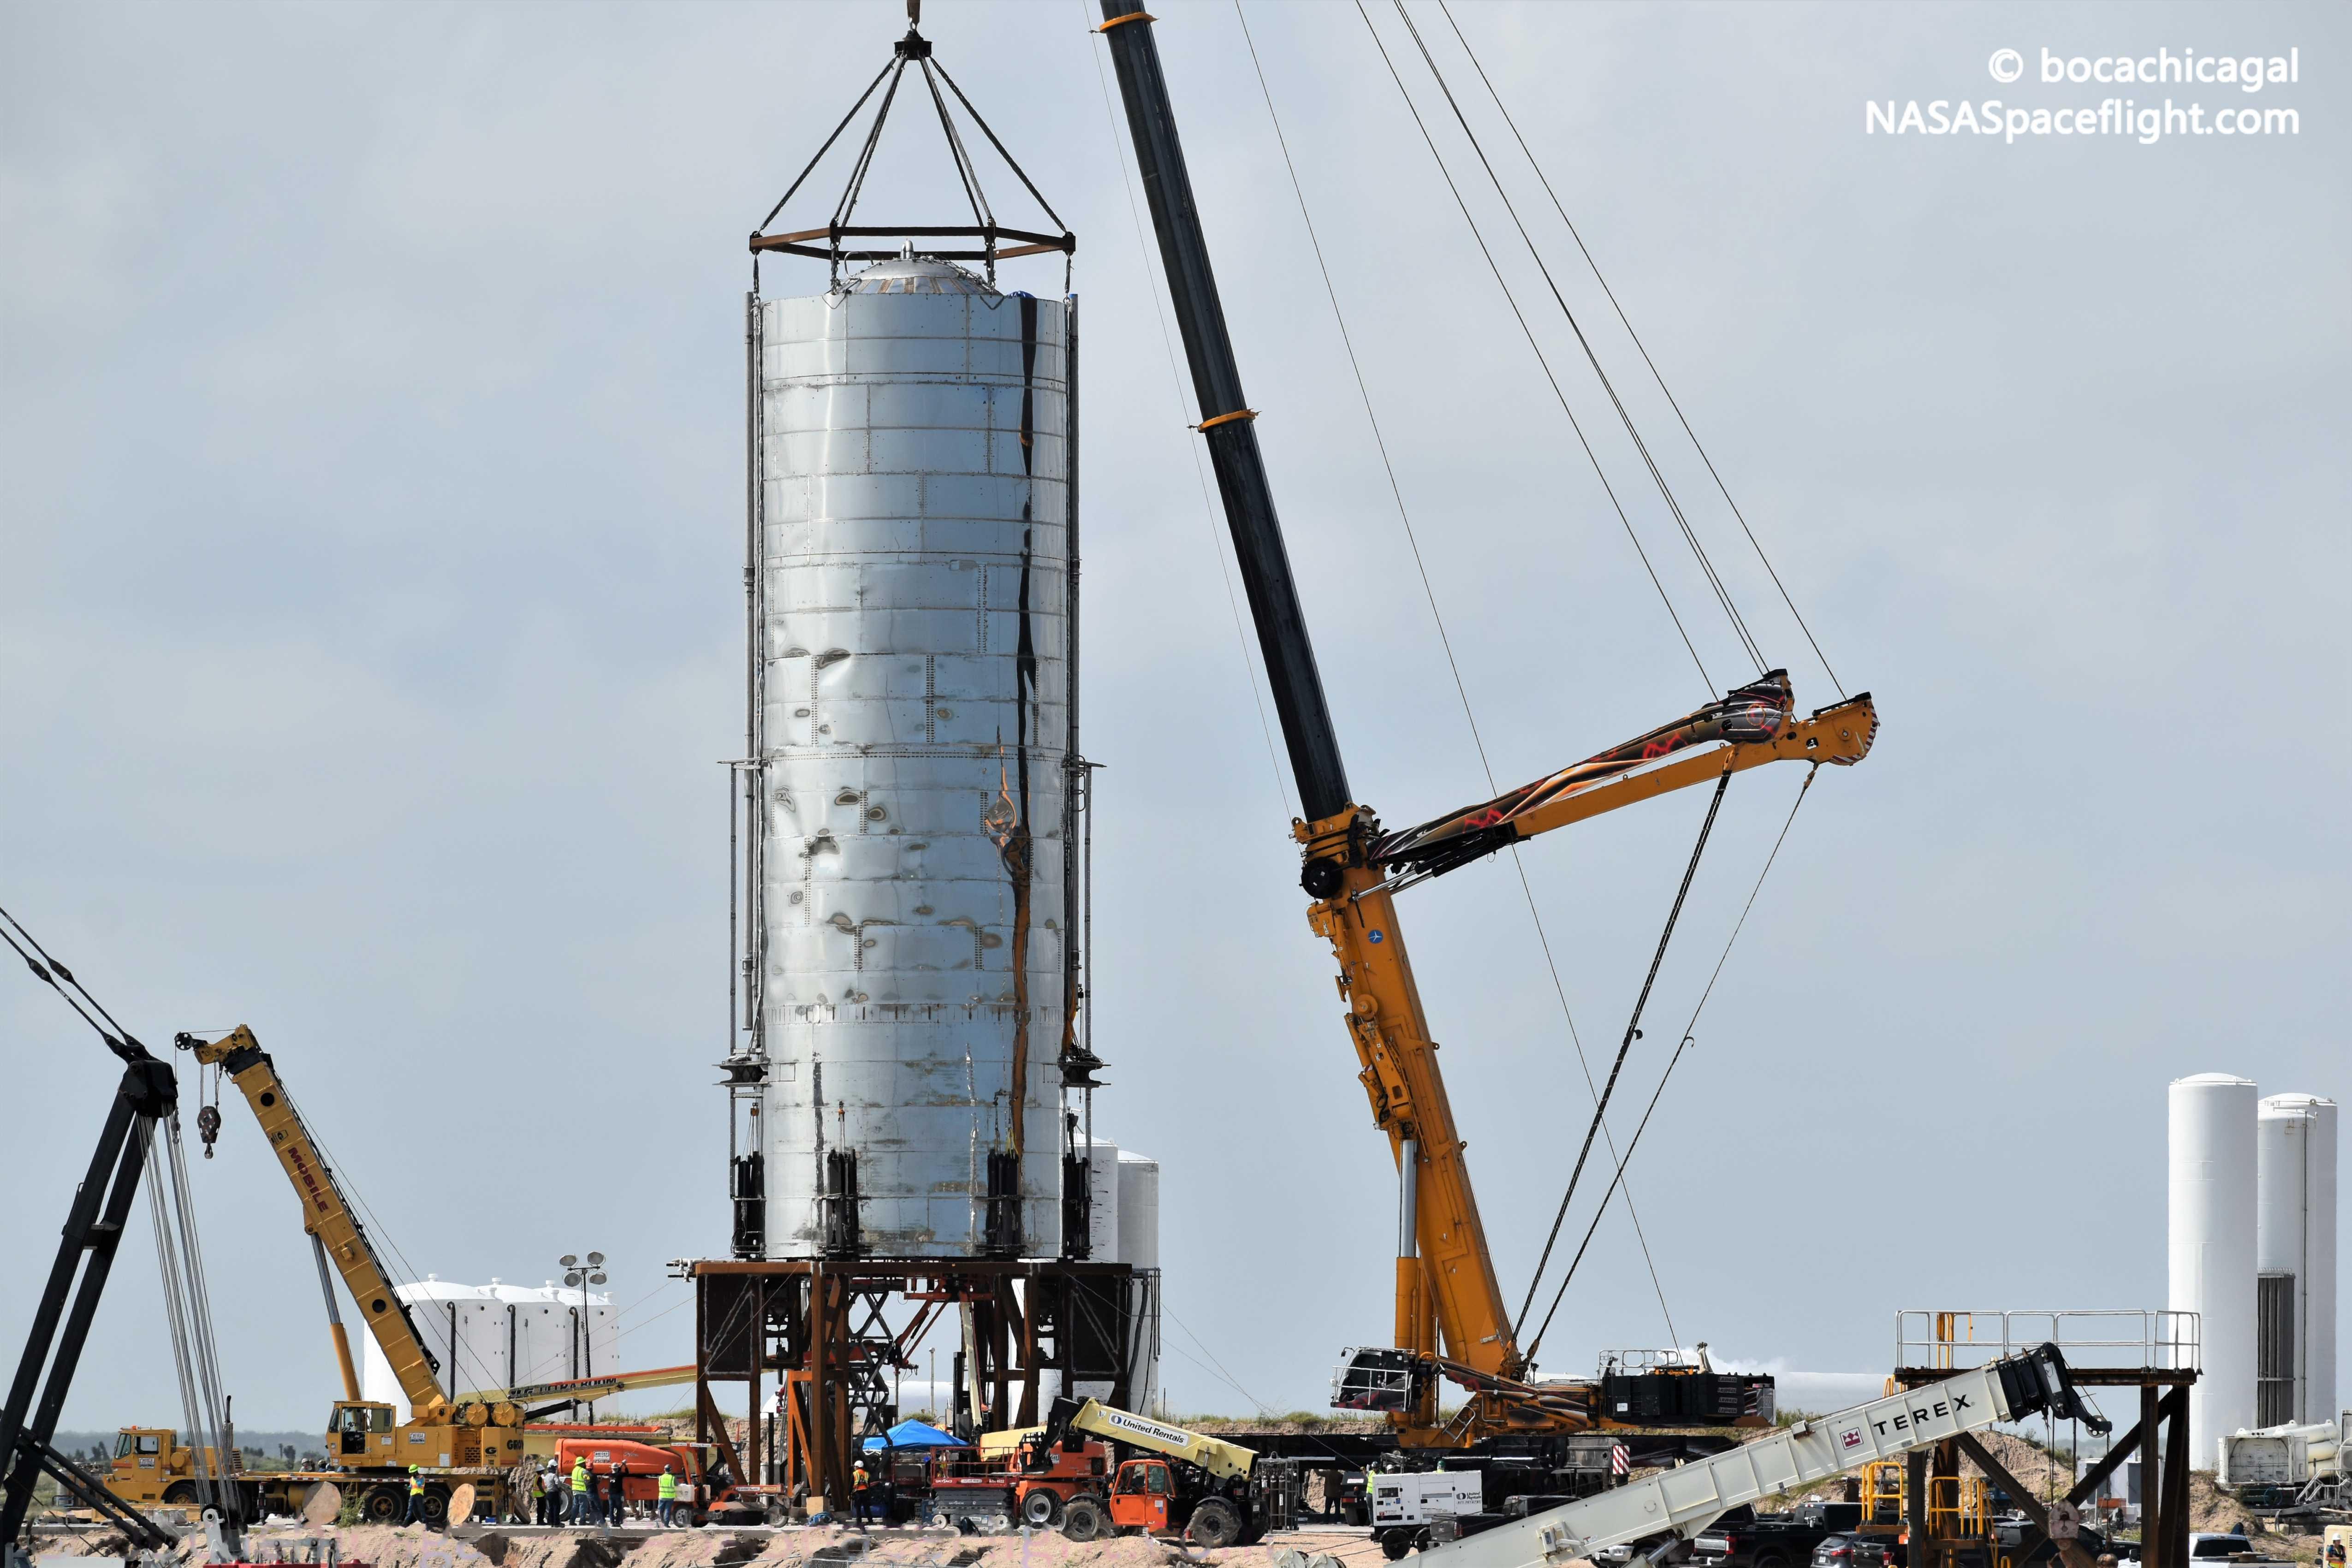 Starship Mk1 103019 (NASASpaceflight – bocachicagal) launch mount 1 (c)